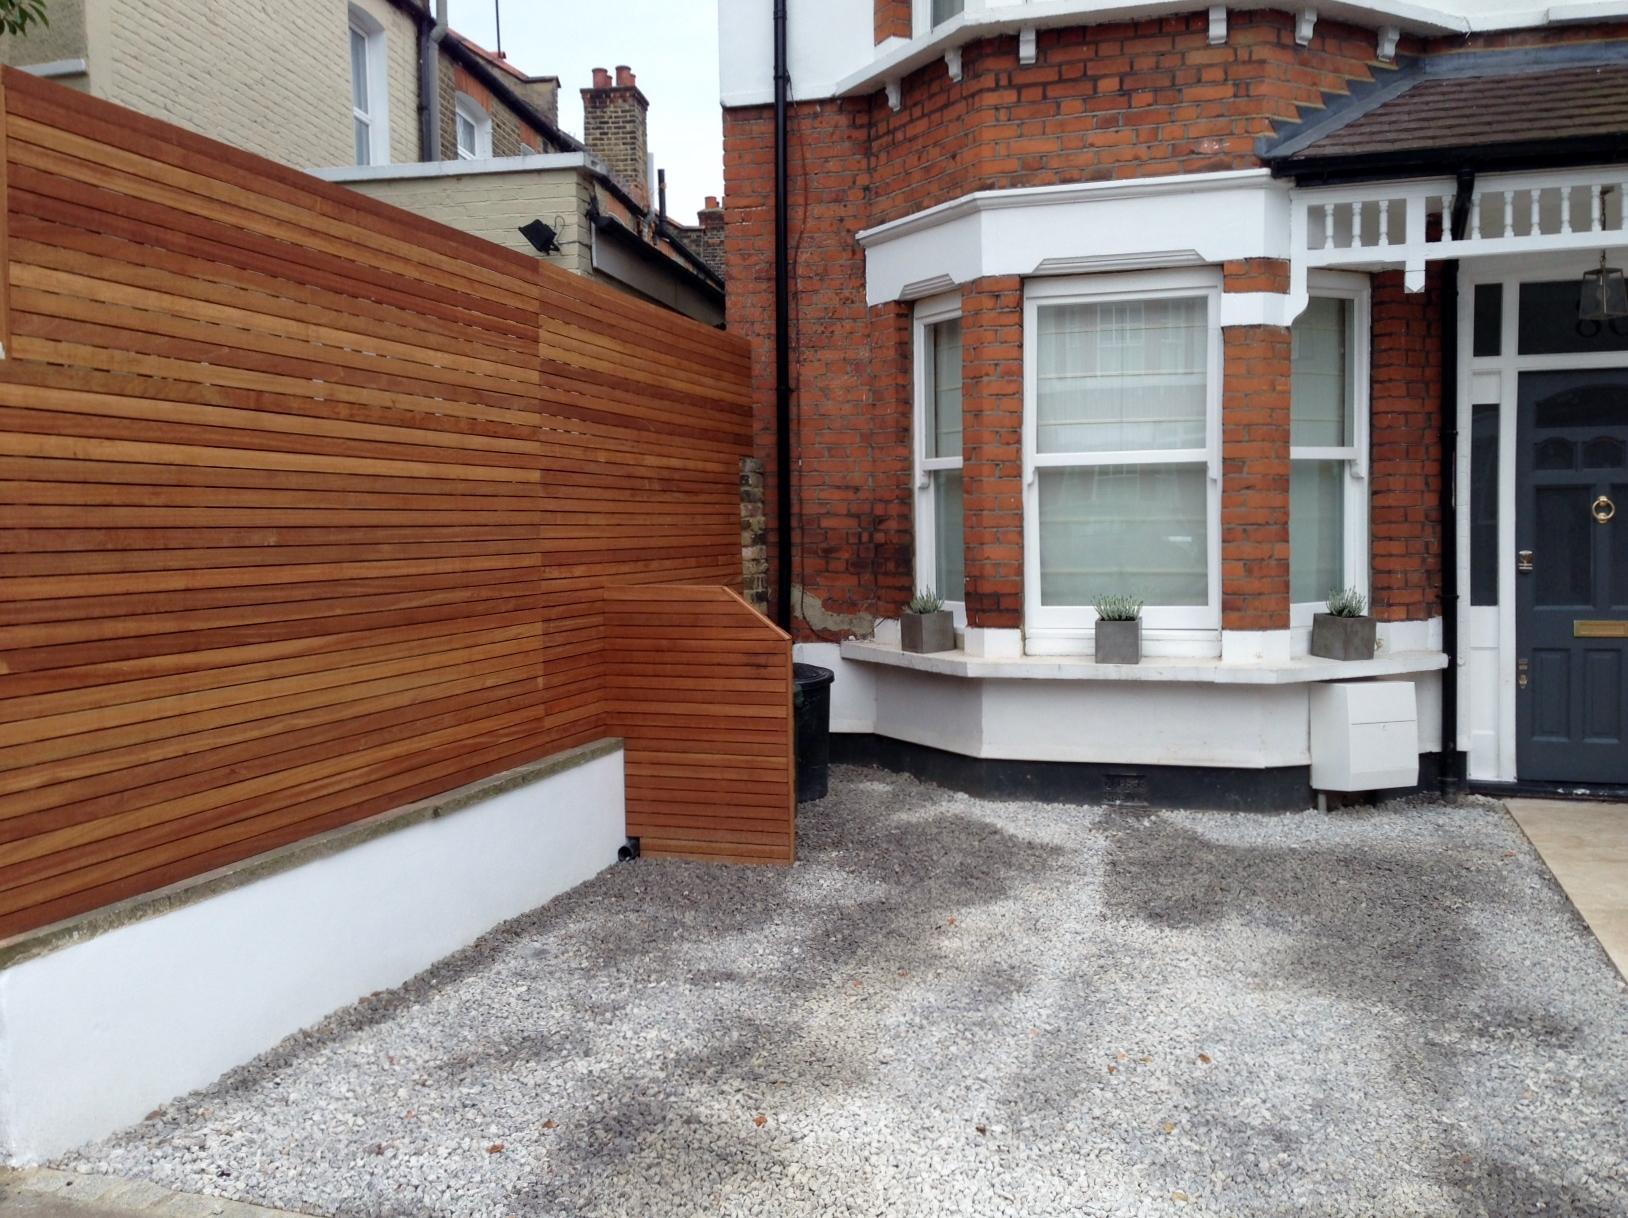 front garden drivewat gravel travertine paving path hardwood privacy screen trellis tooting london (2)